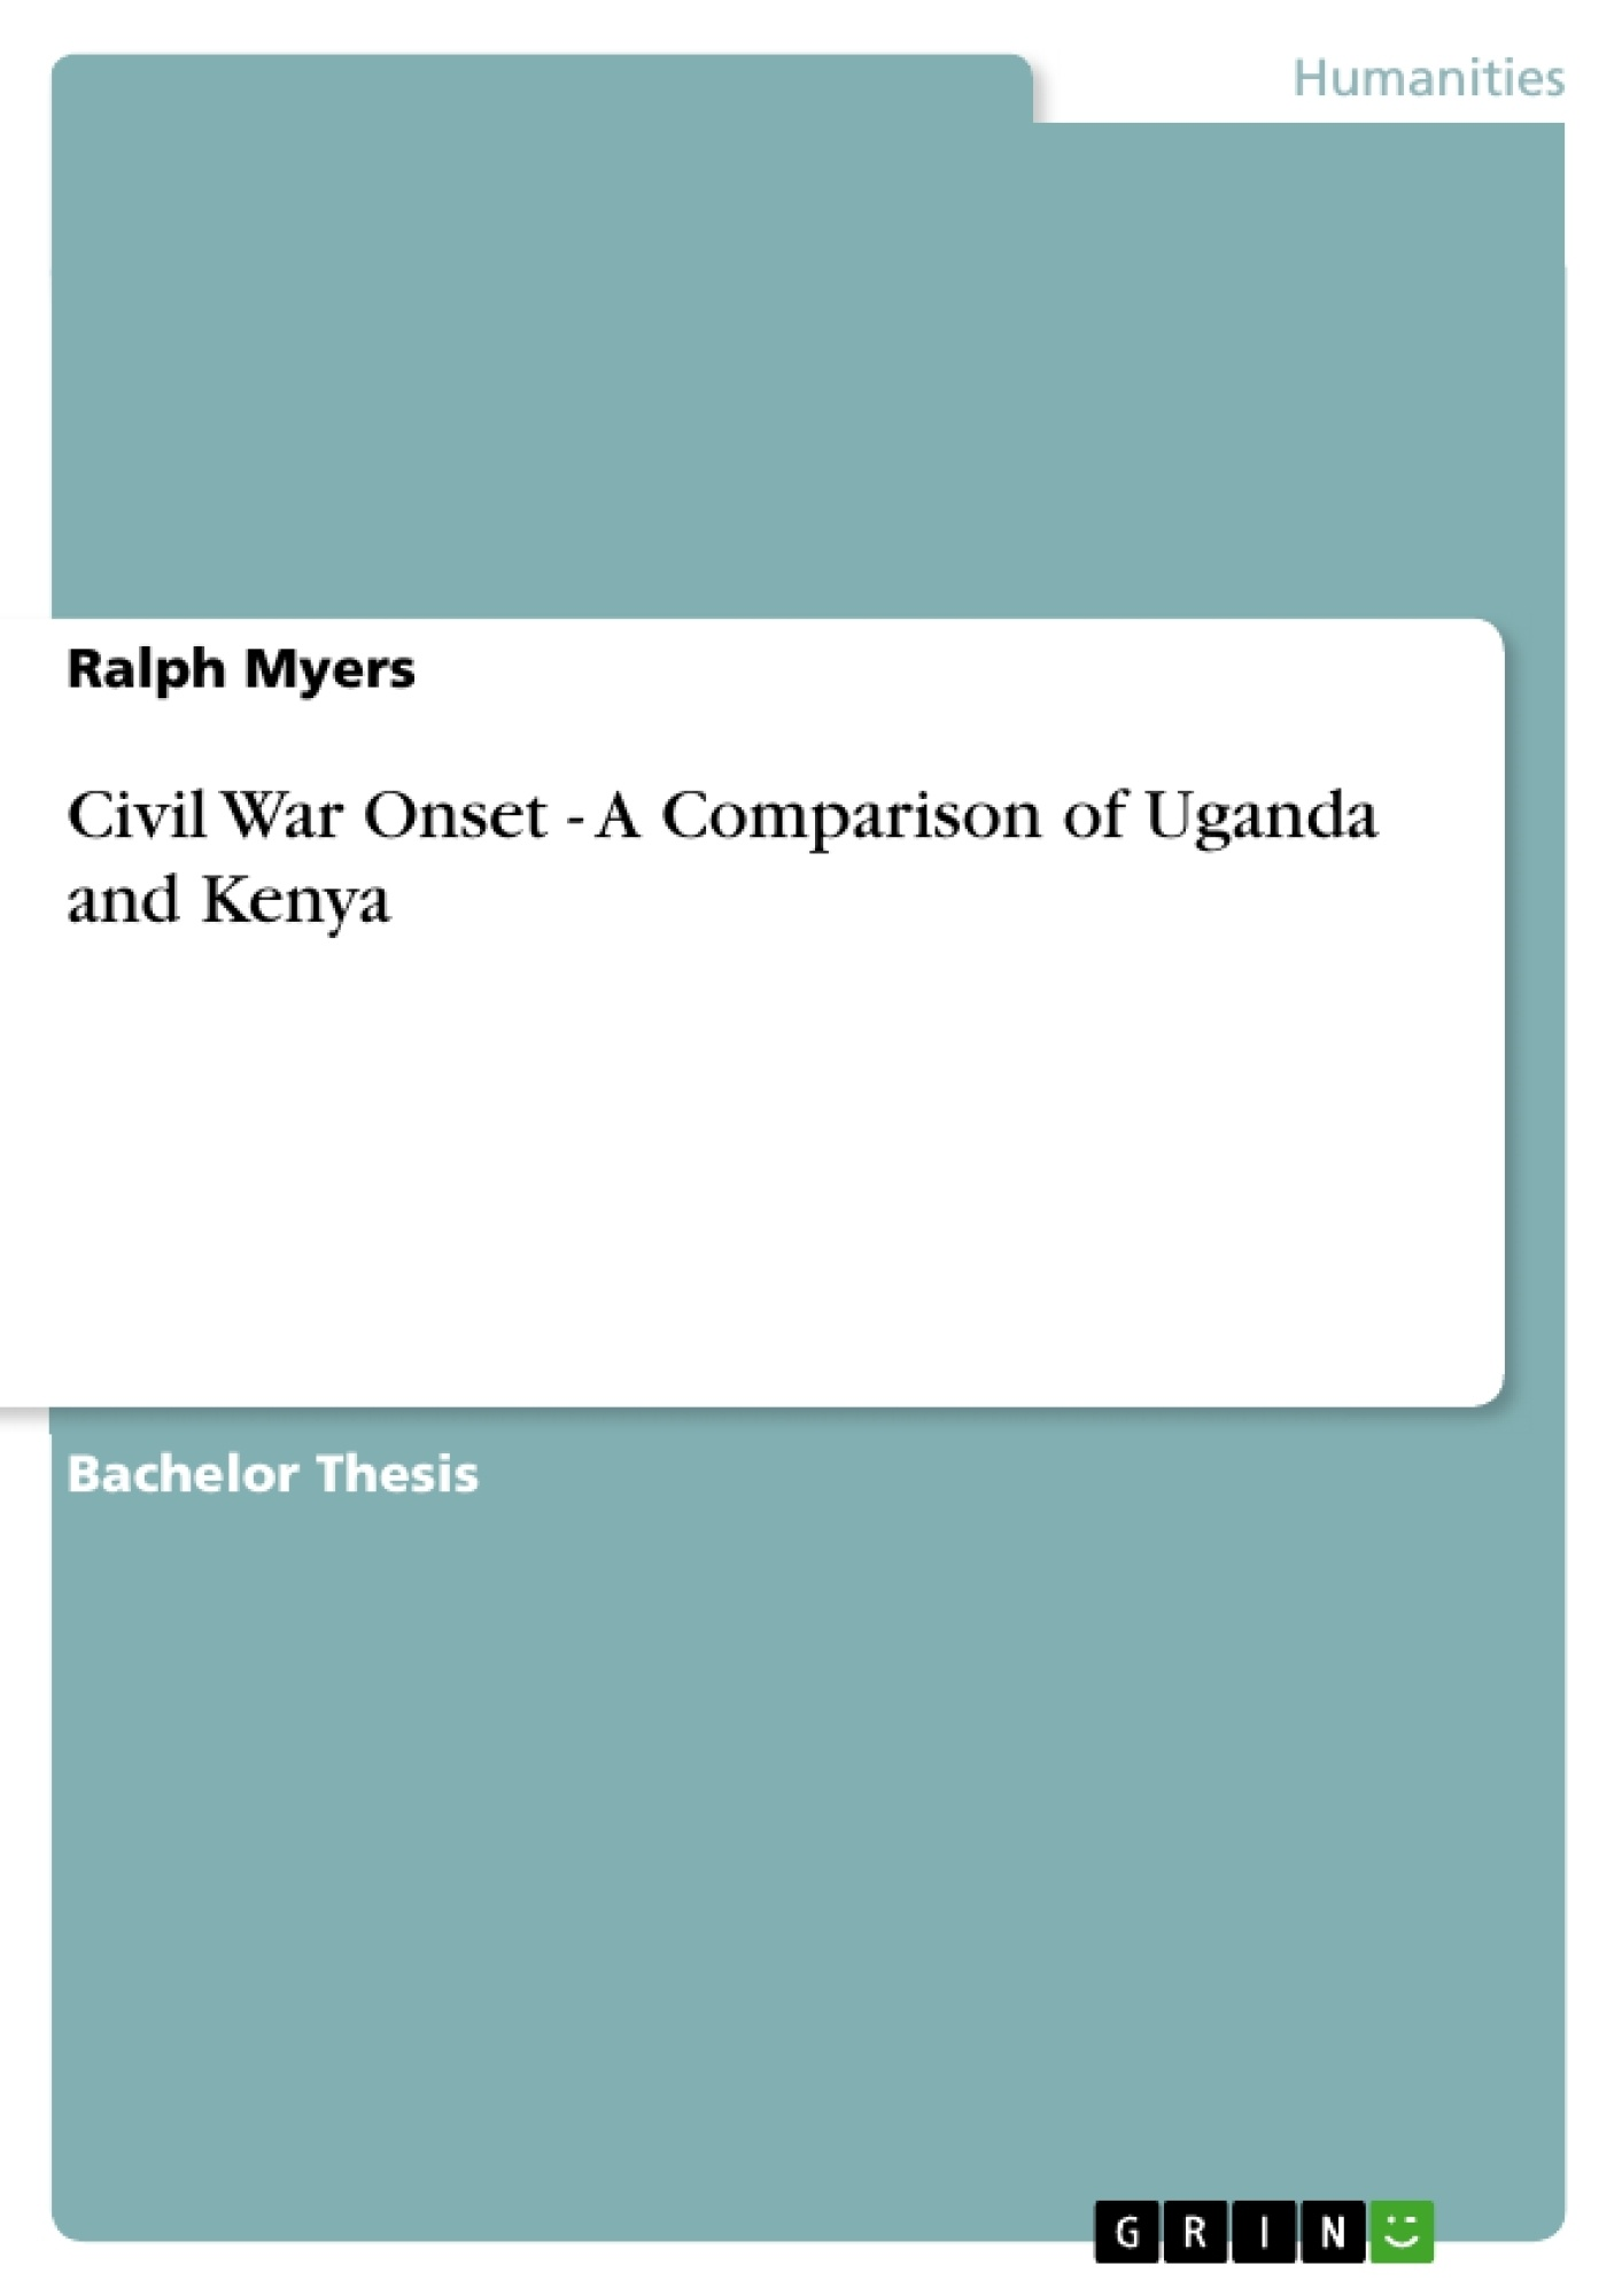 Title: Civil War Onset - A Comparison of Uganda and Kenya